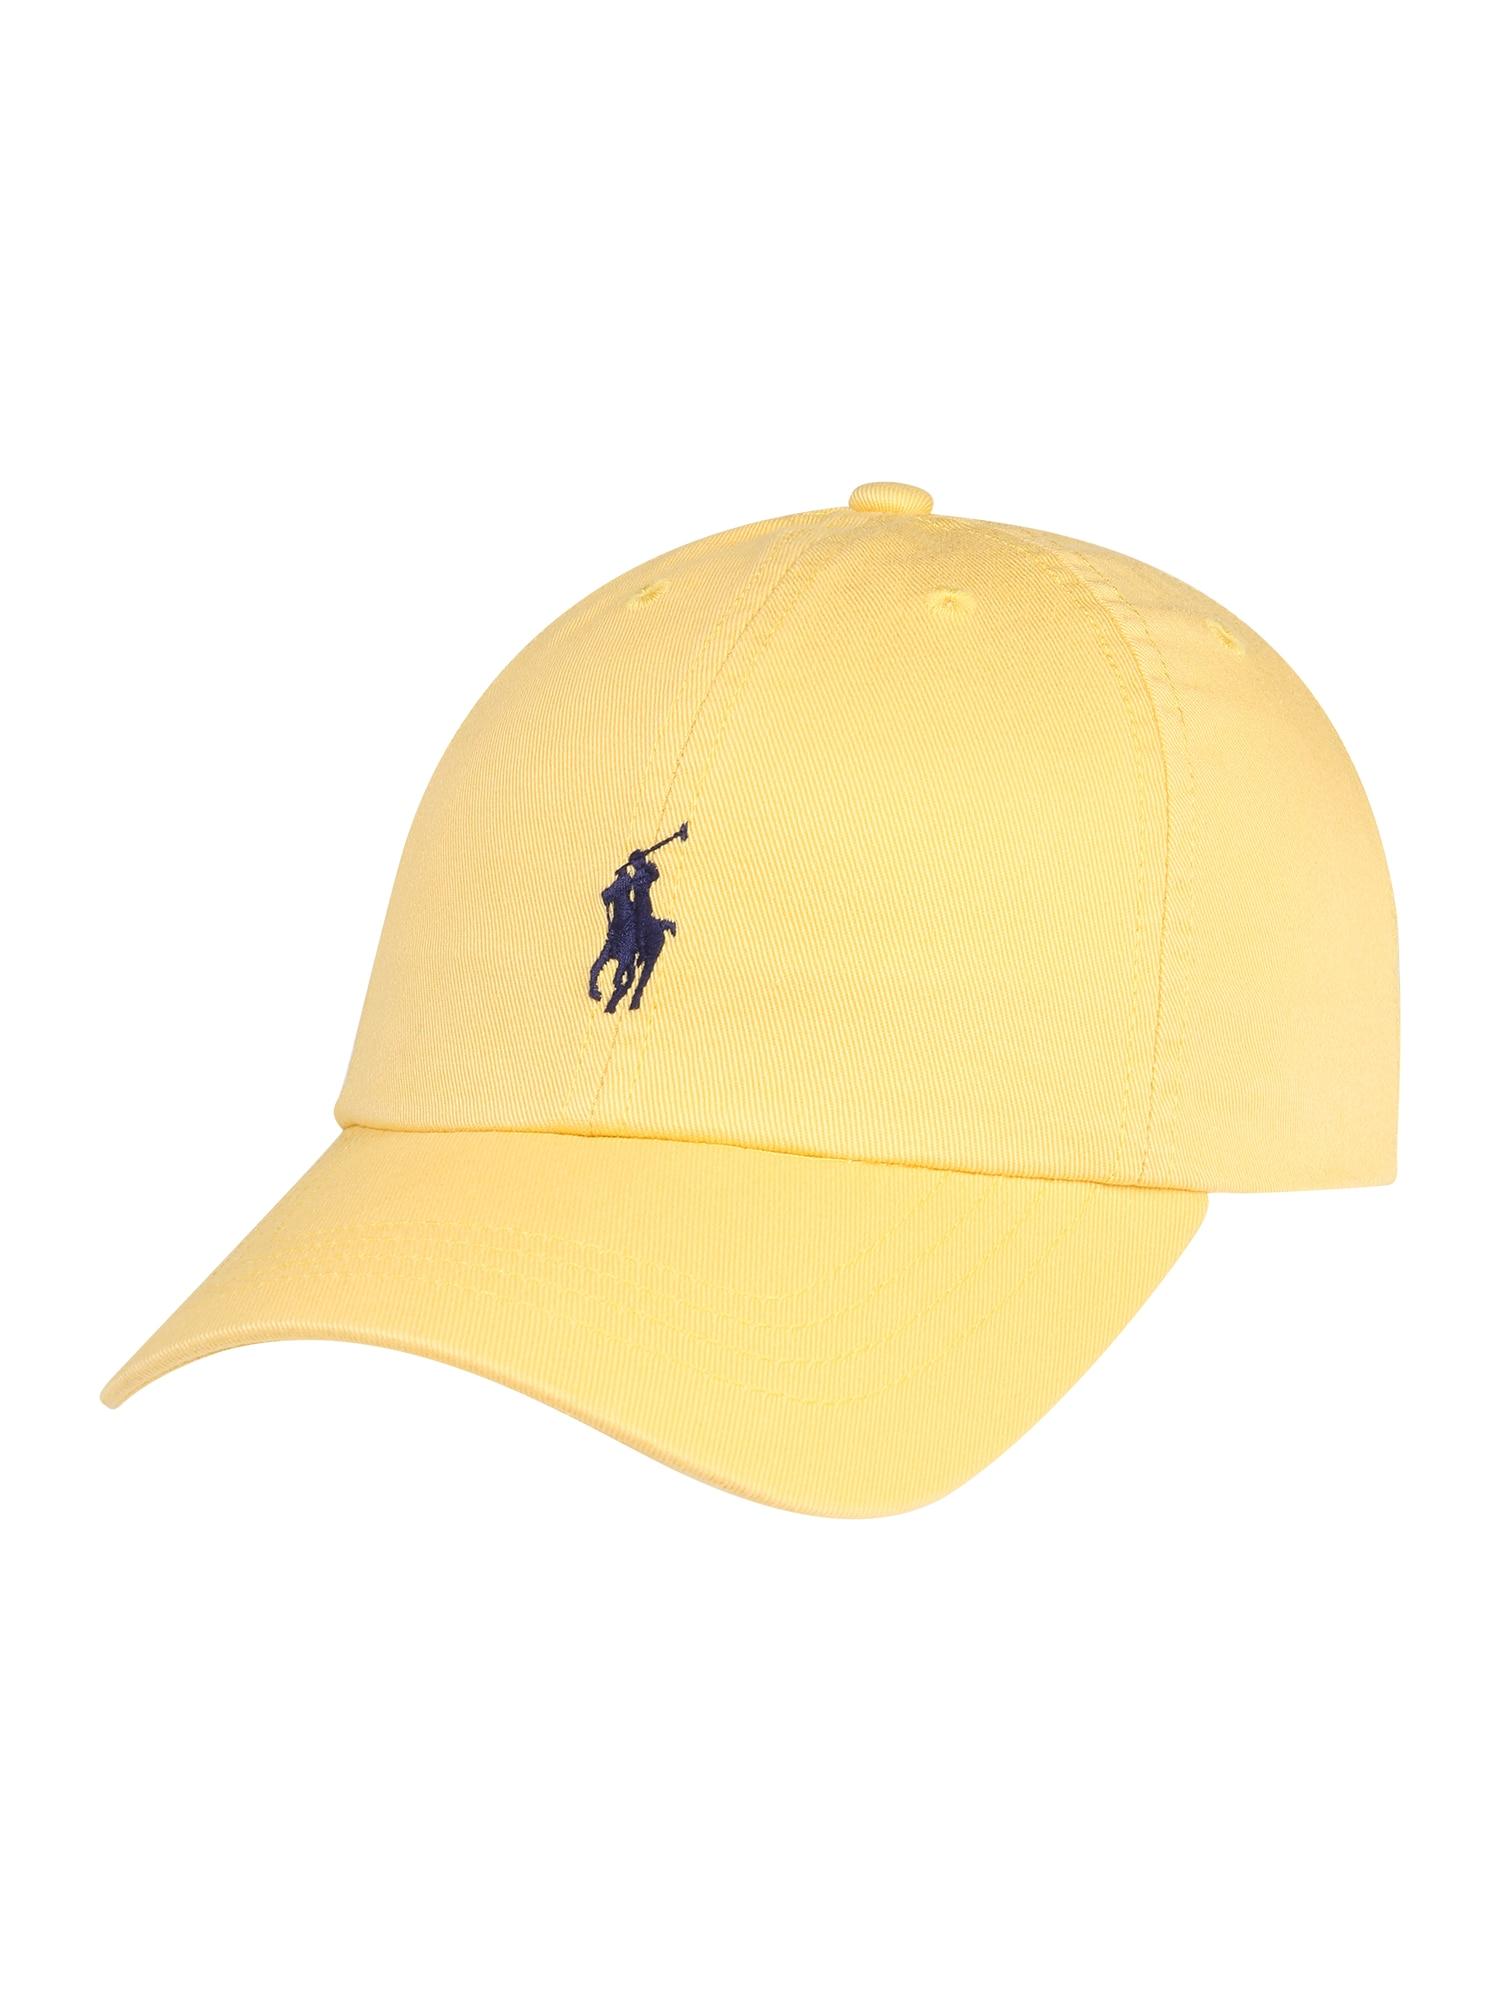 Klobouk CHINO TWILL-CLASSIC CAP-AC-HAT žlutá POLO RALPH LAUREN